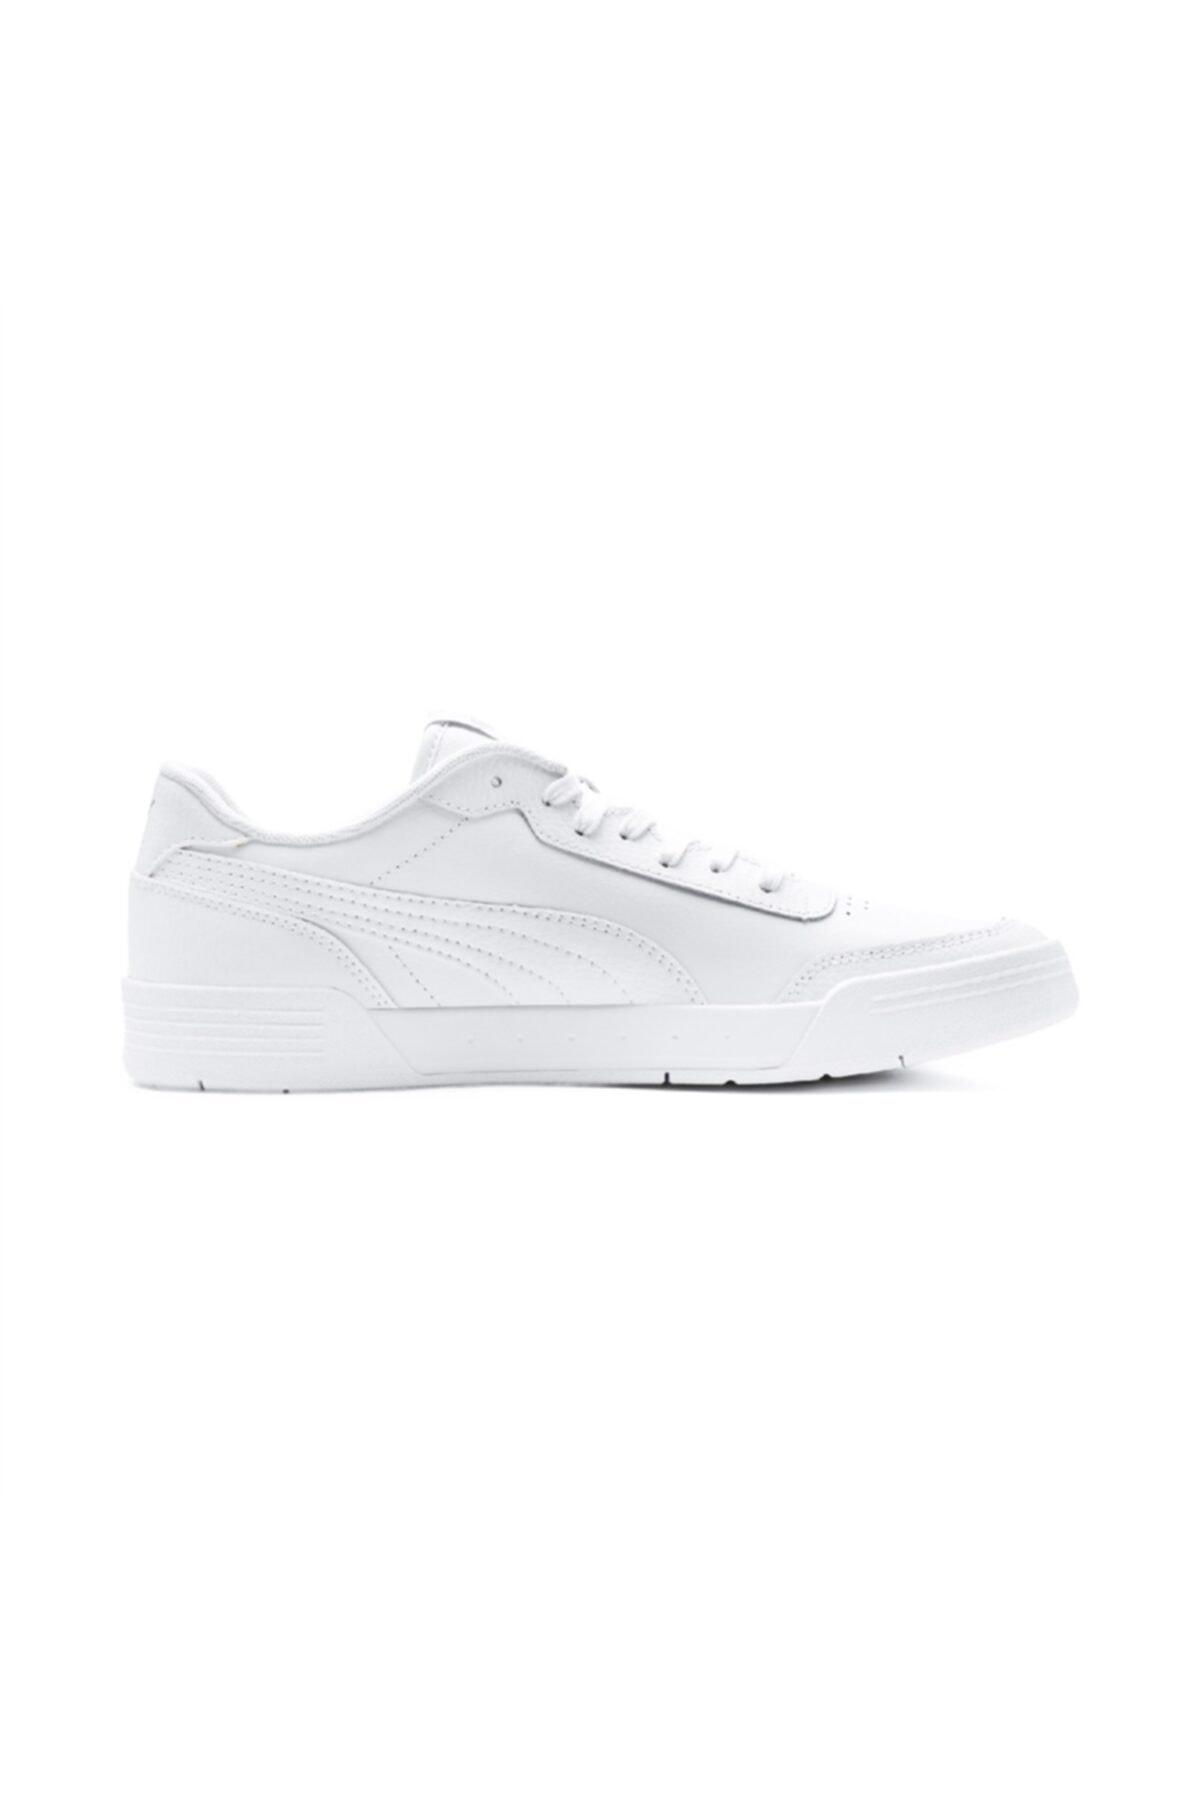 Puma Erkek Sneaker Caracal - 36986302 2